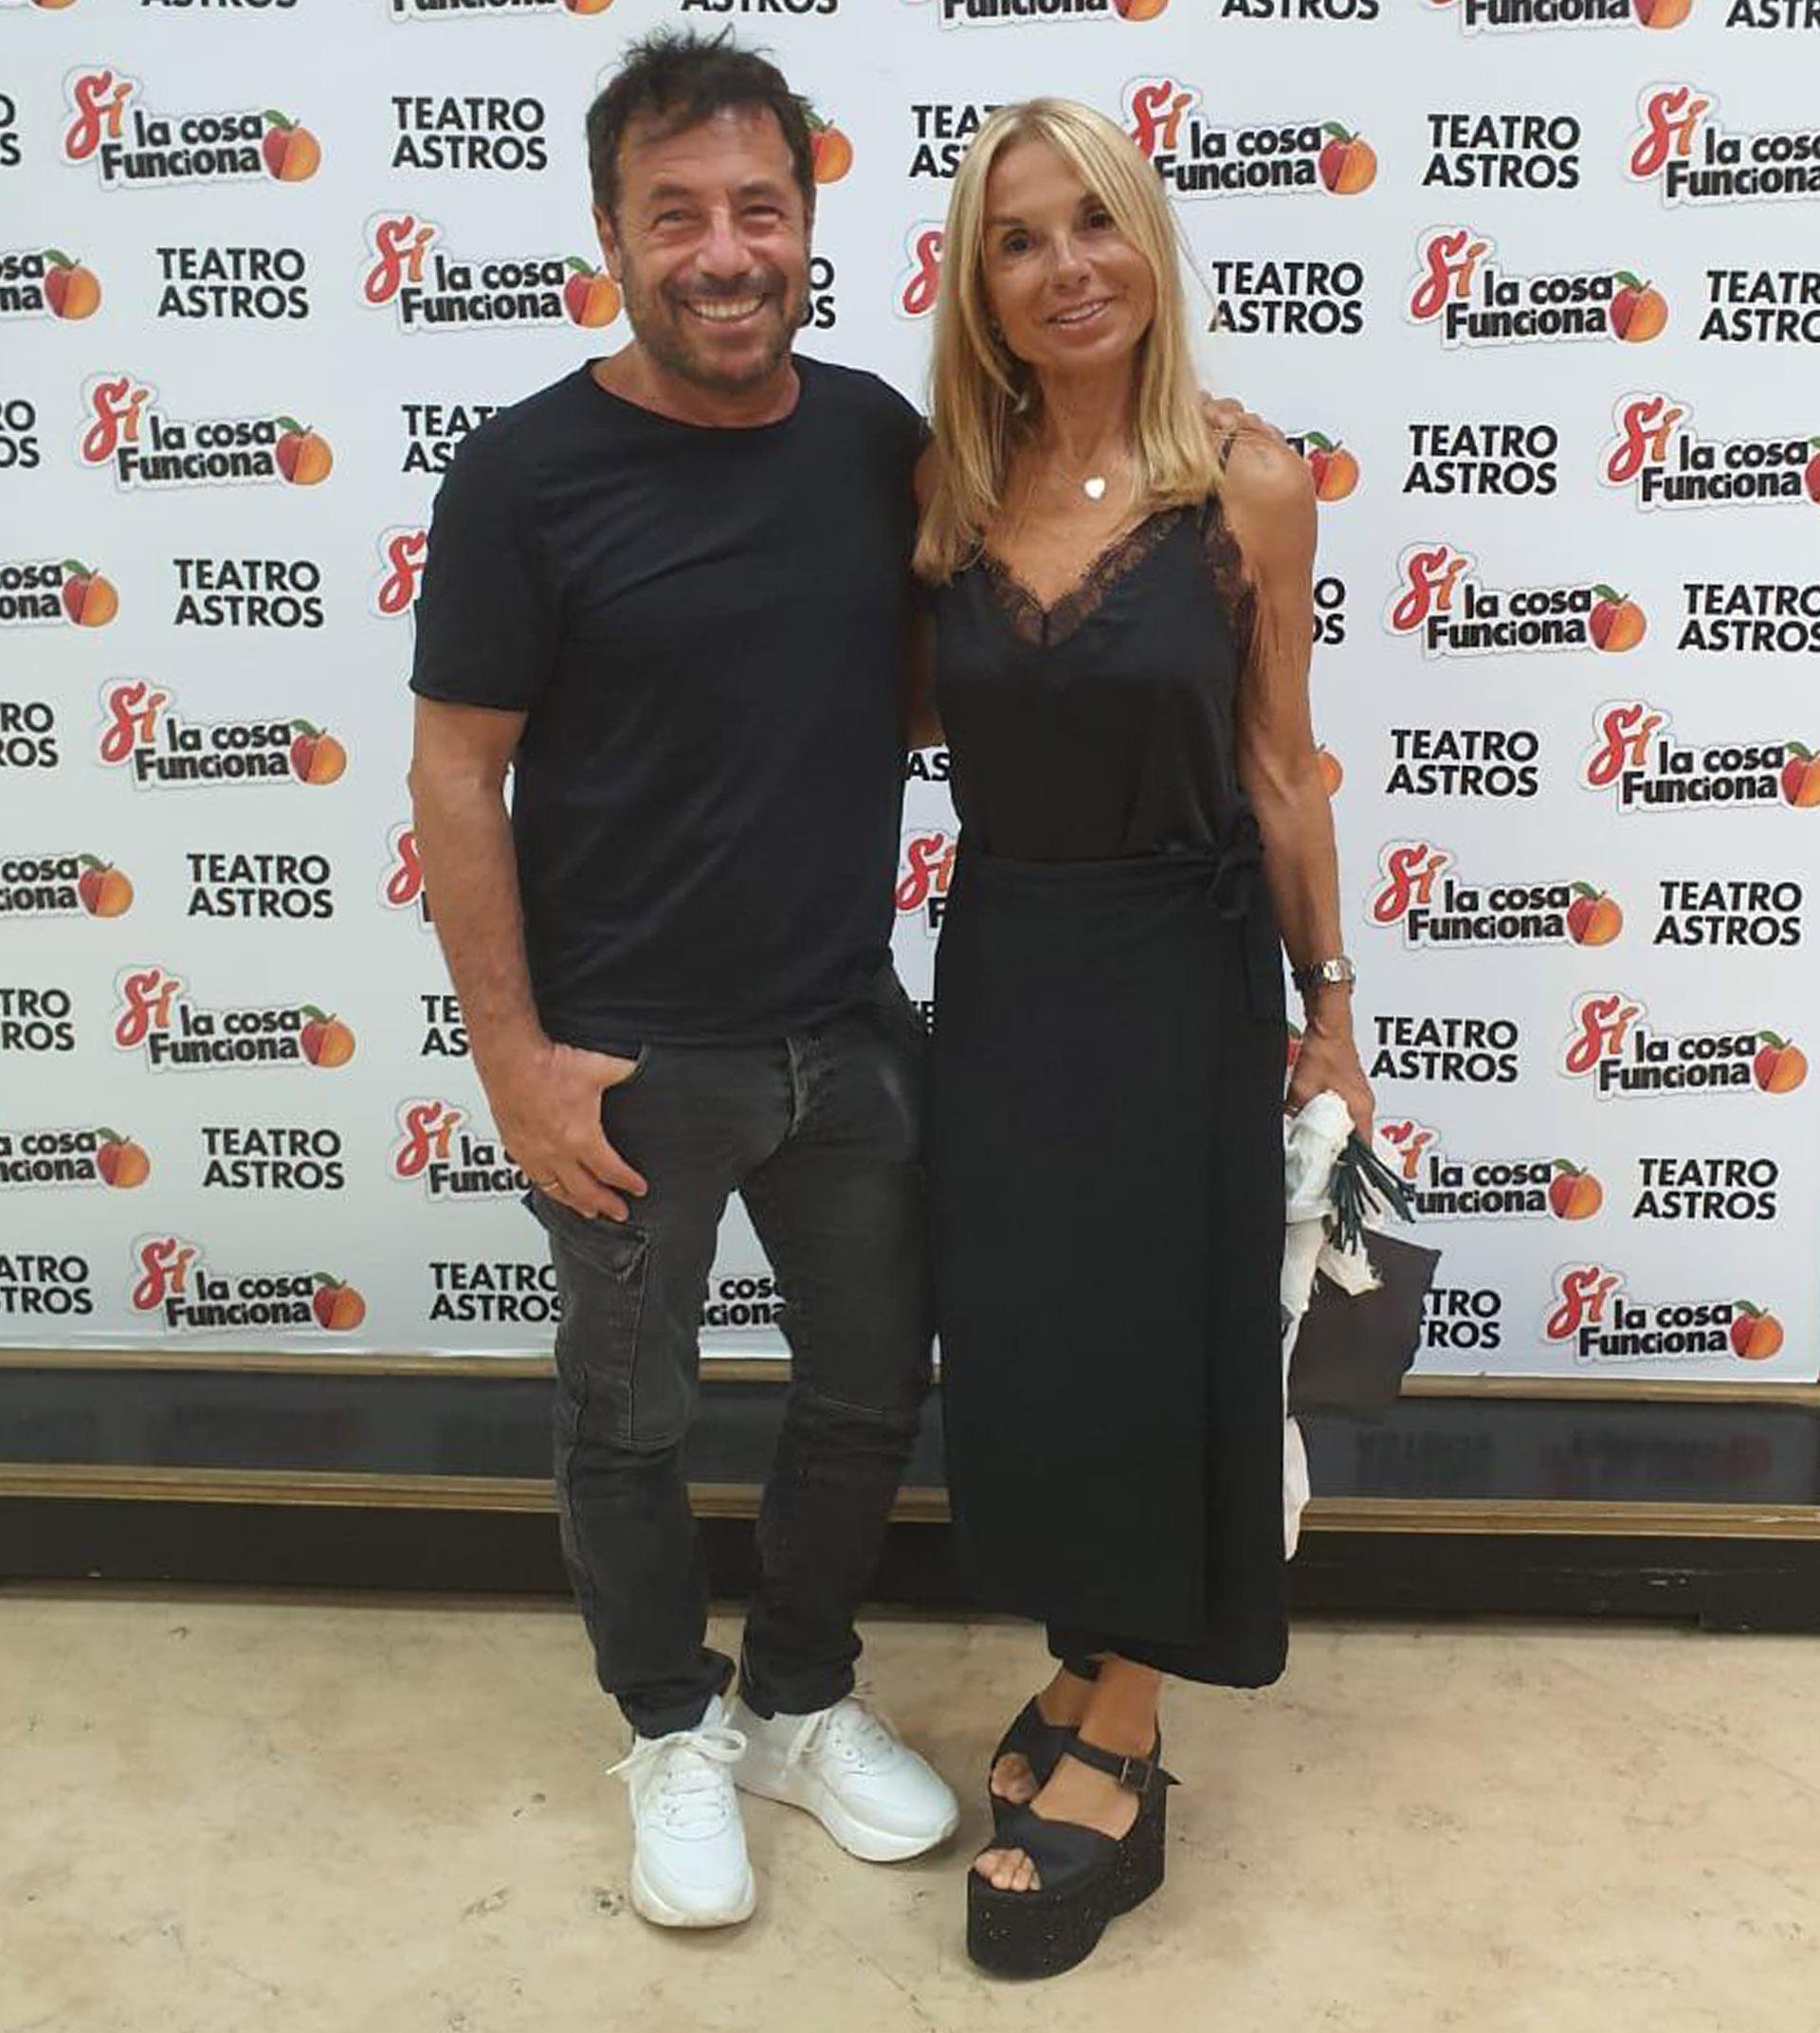 Ricky Sarkany y su esposa Graciela Papini